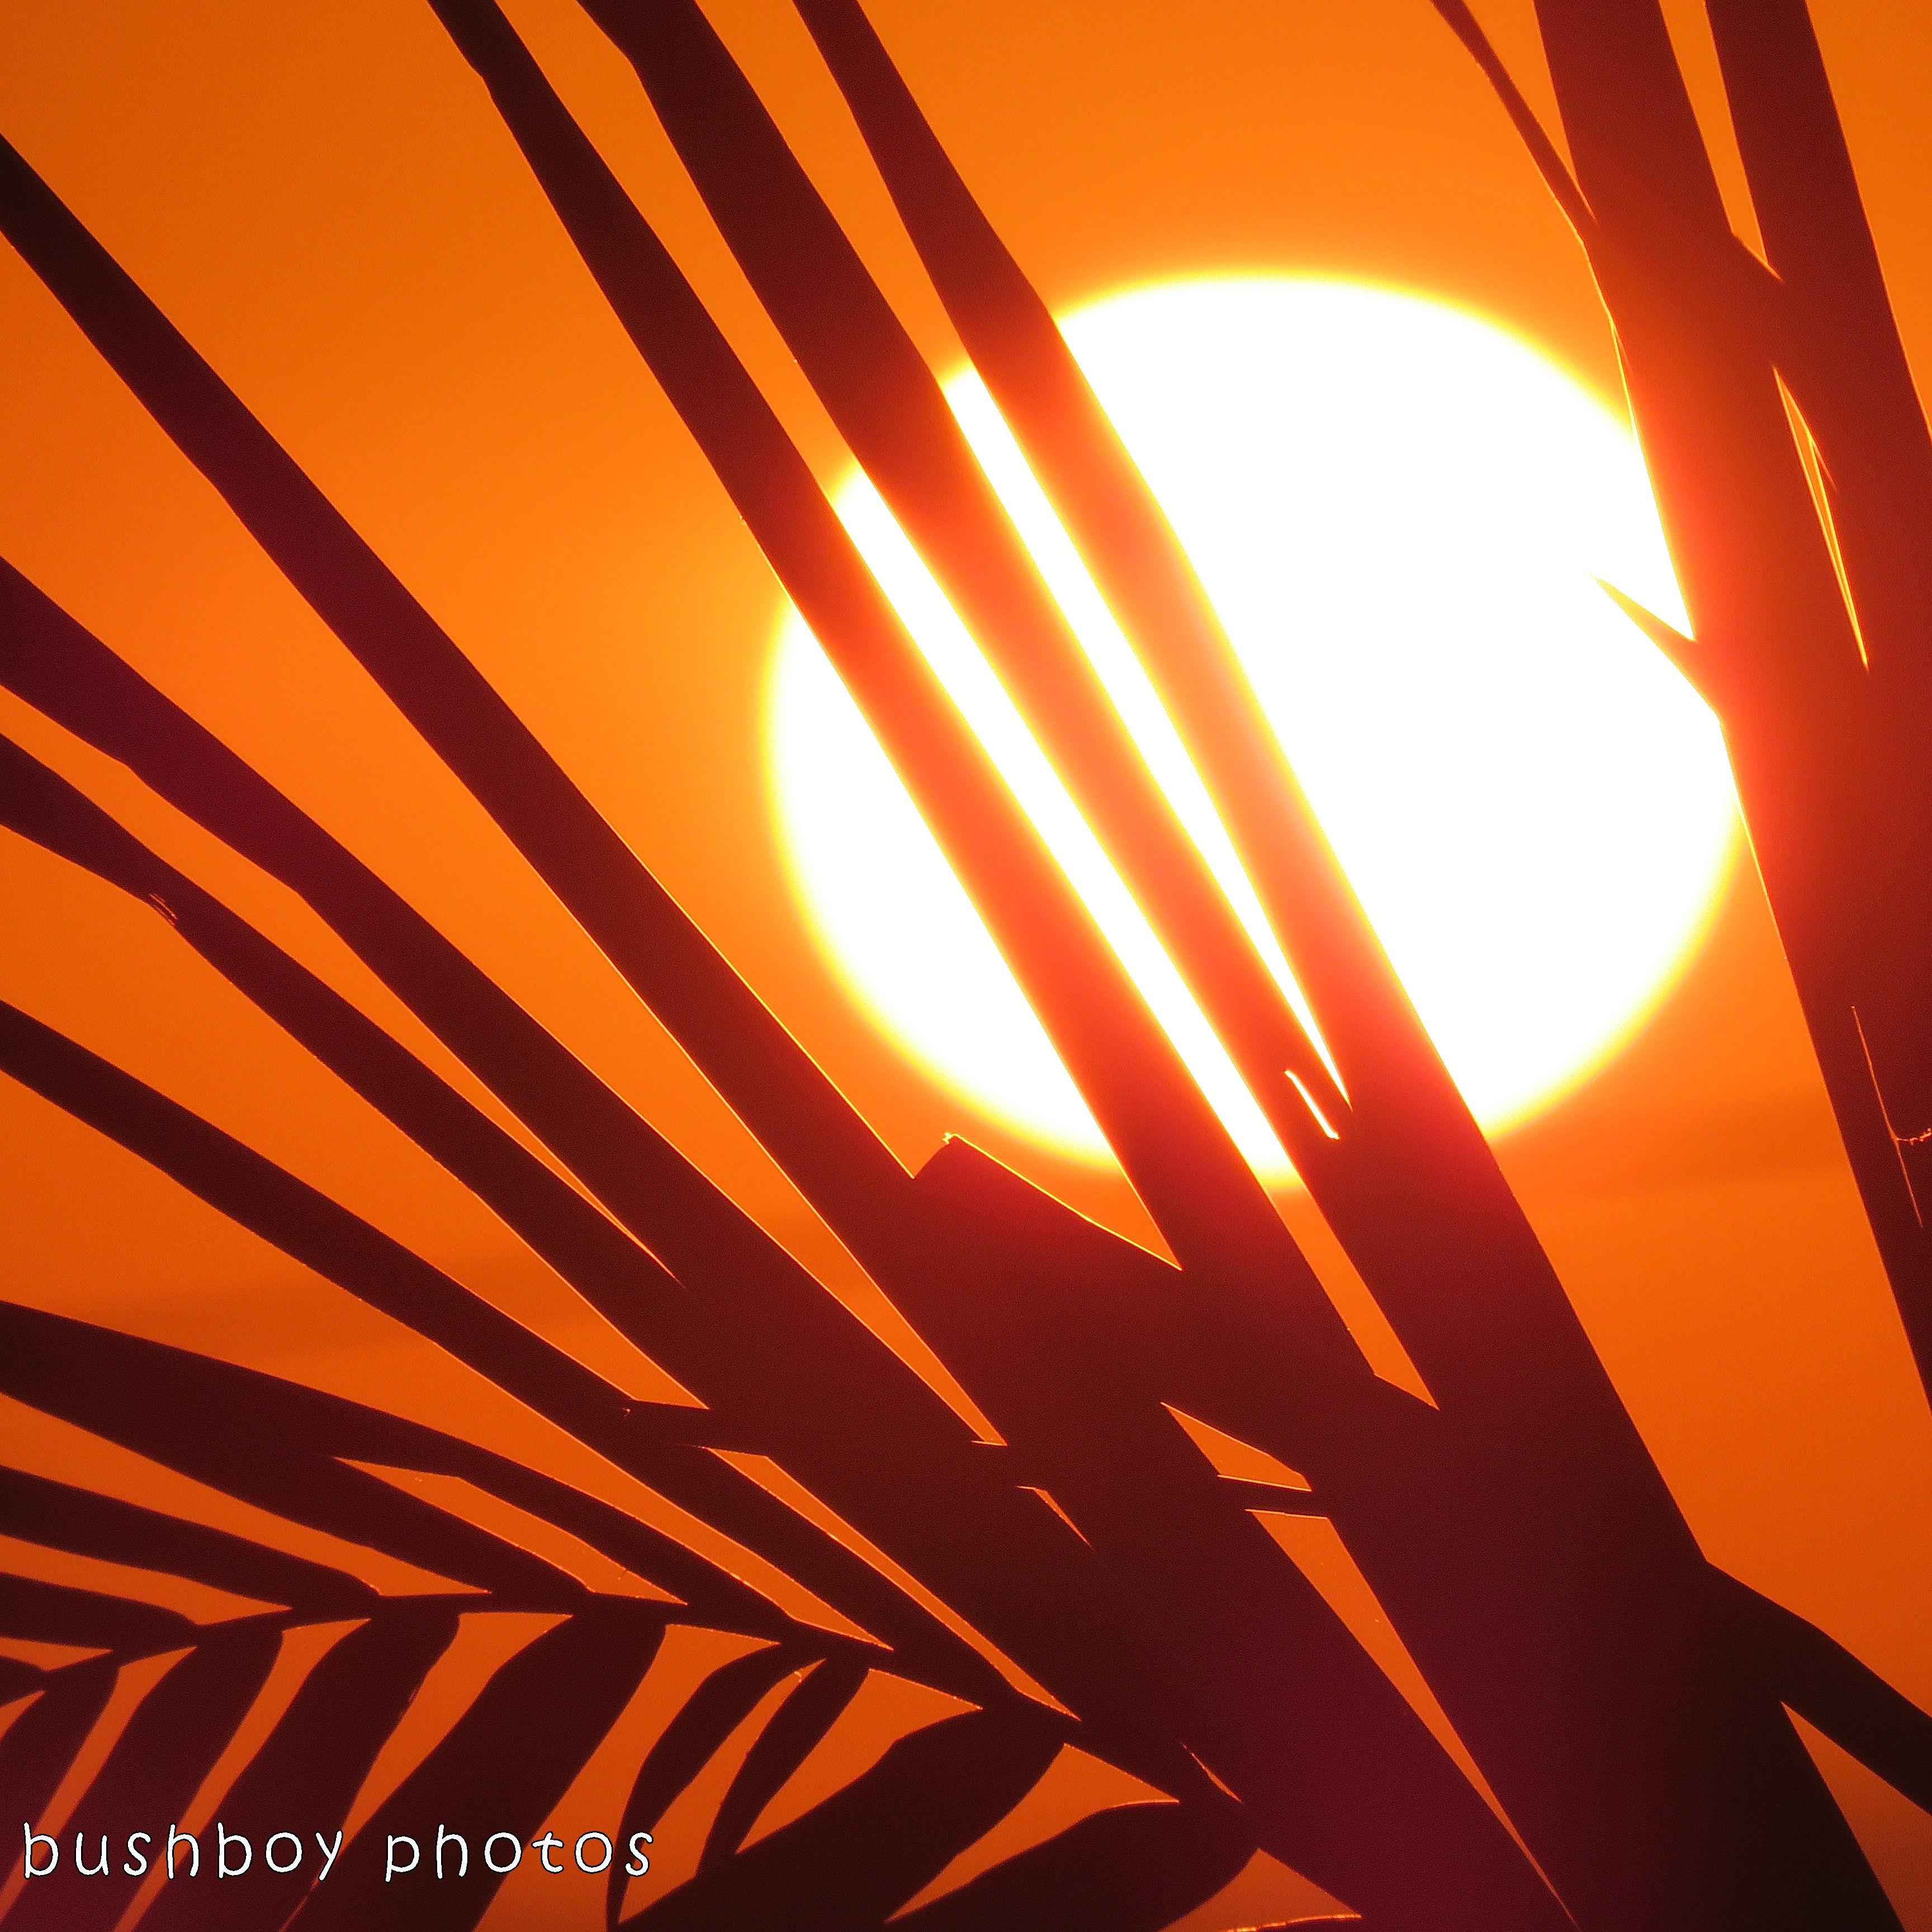 1712_standby010_blog challenge_squaresky_sunset